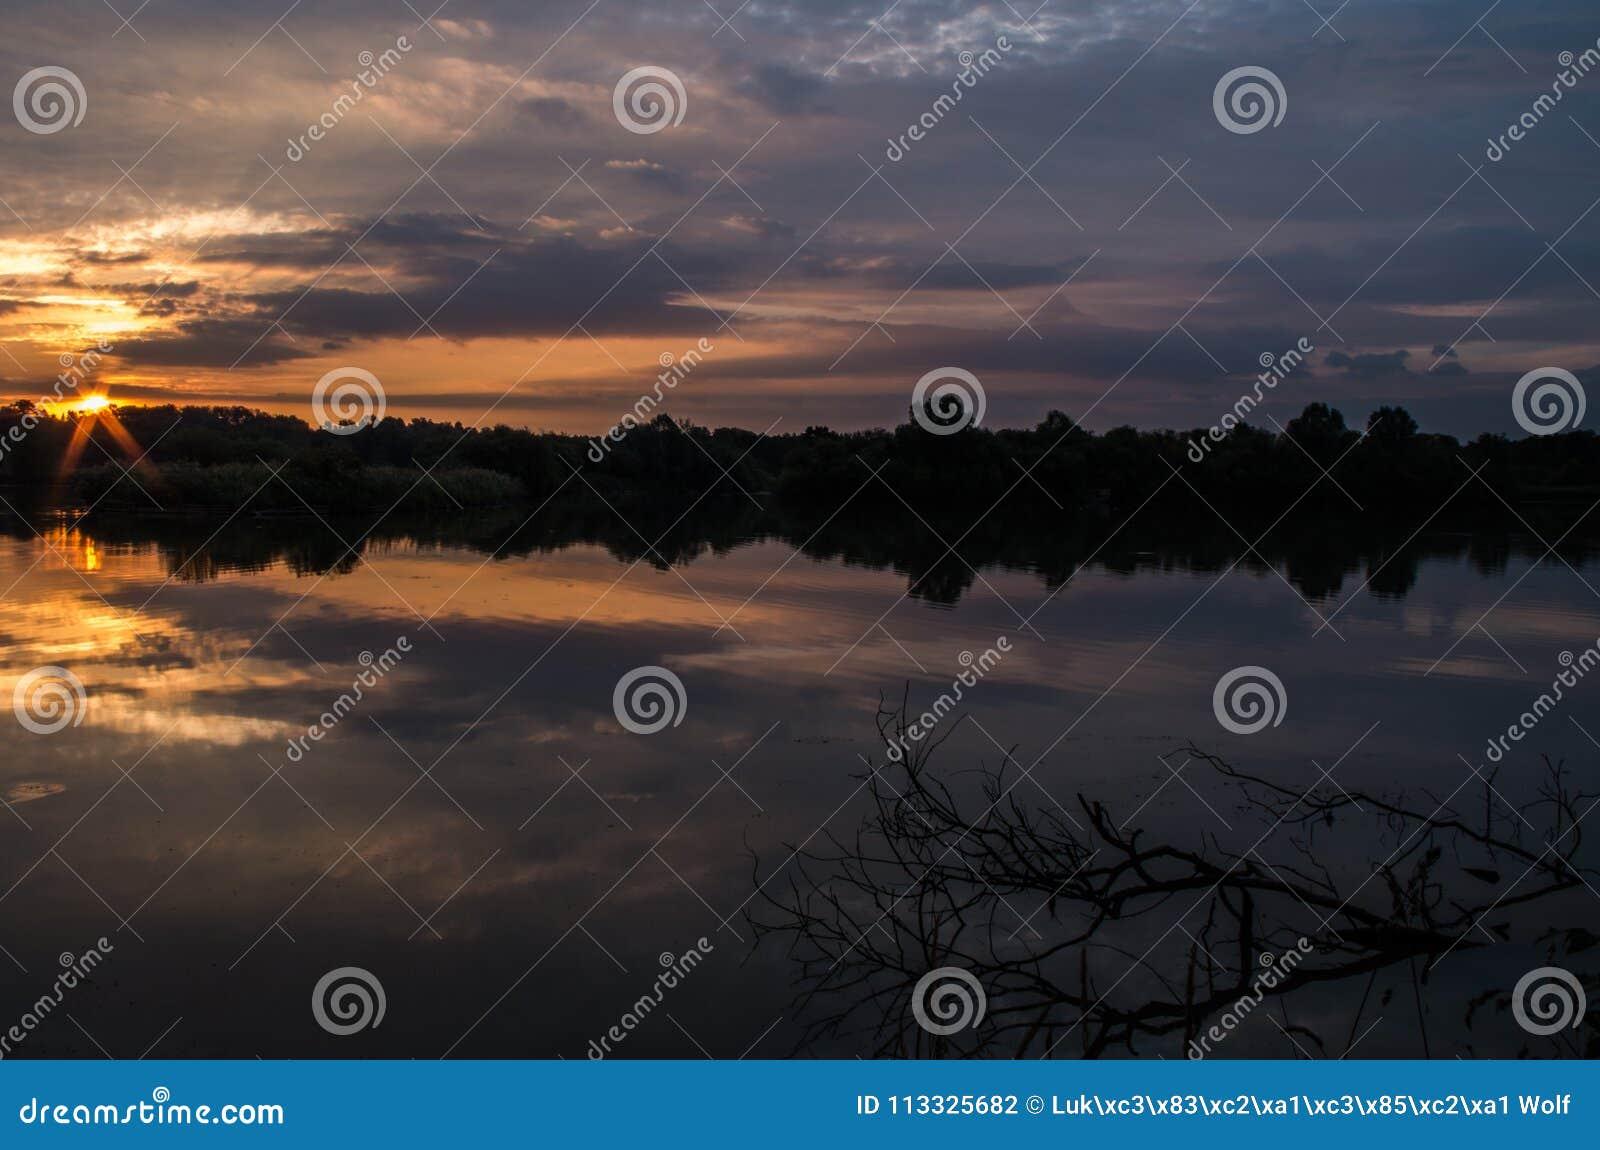 Sunrise on a pond